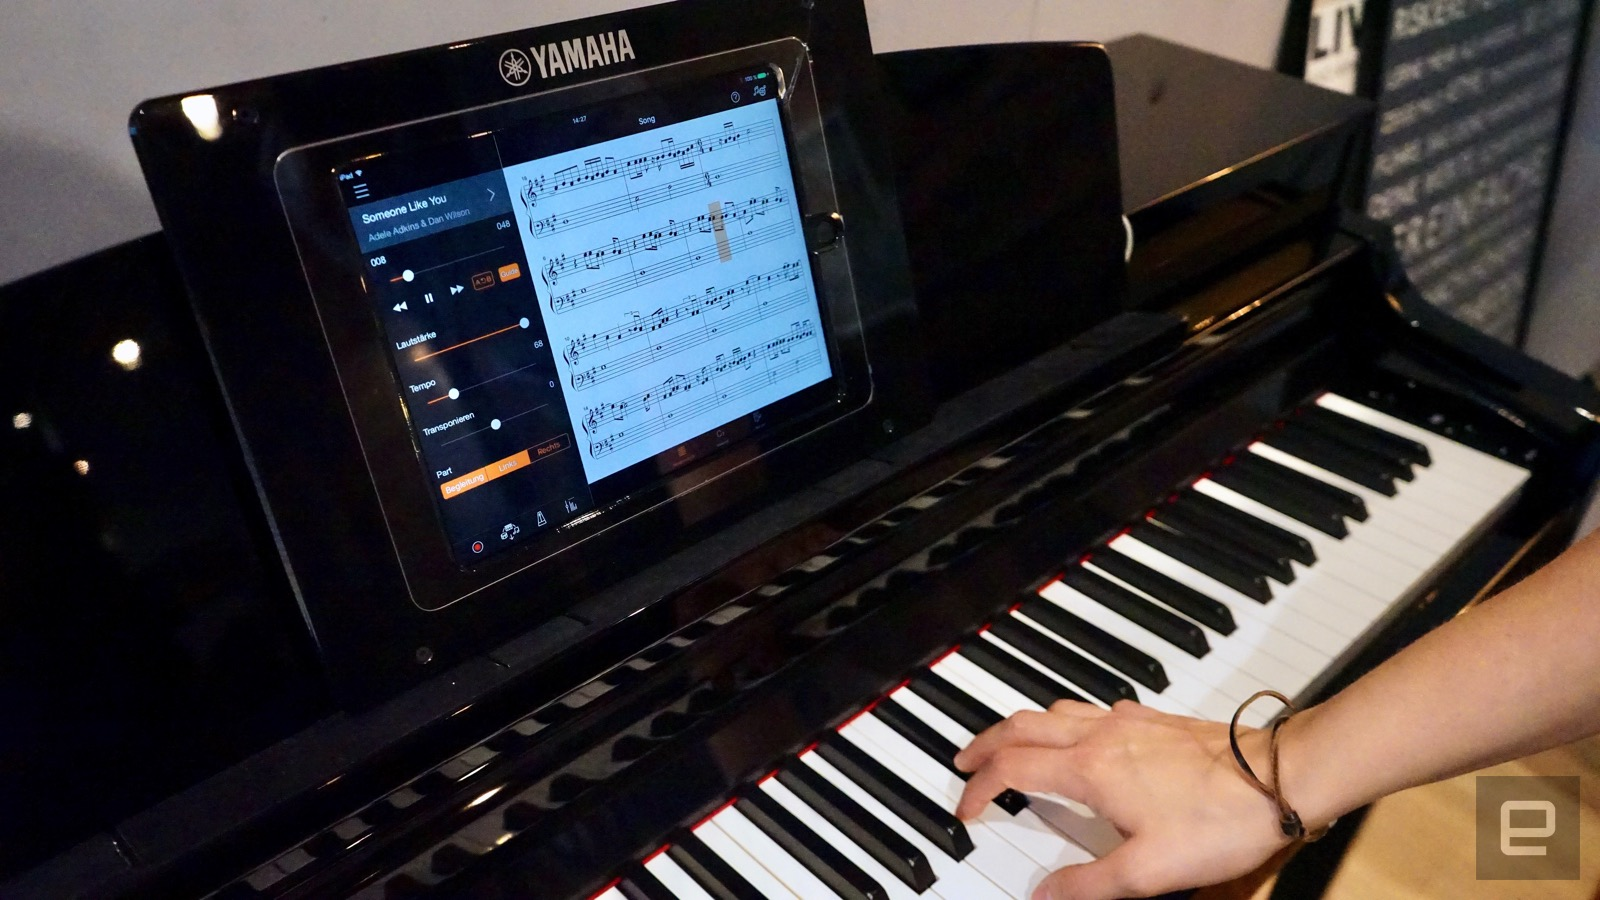 Yamaha clavinova smart alexa